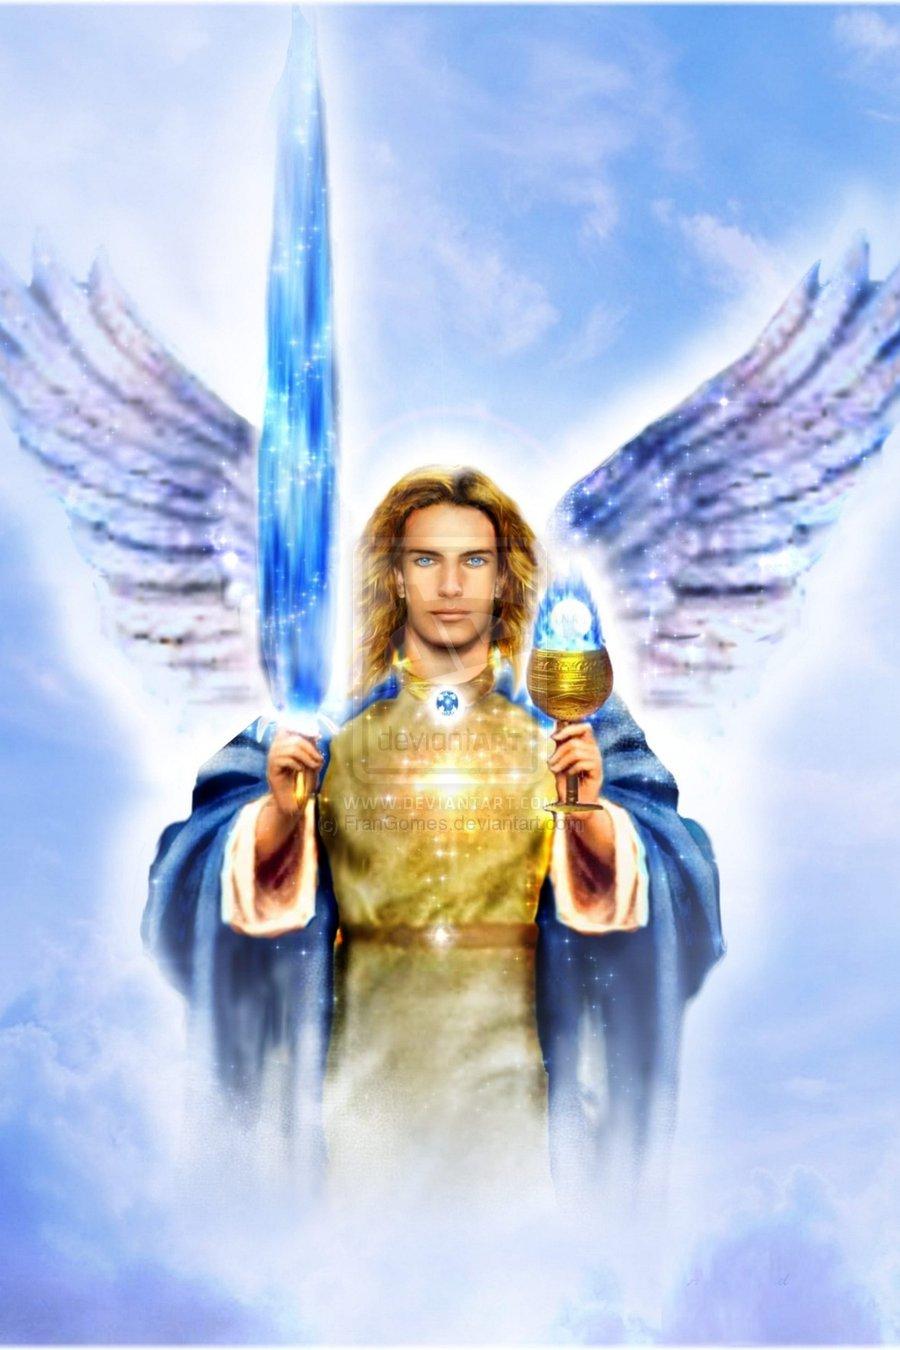 N'oublions pas nos chers anges-gardiens ! - Page 3 Archangel_michael_by_frangomes-d42es5p